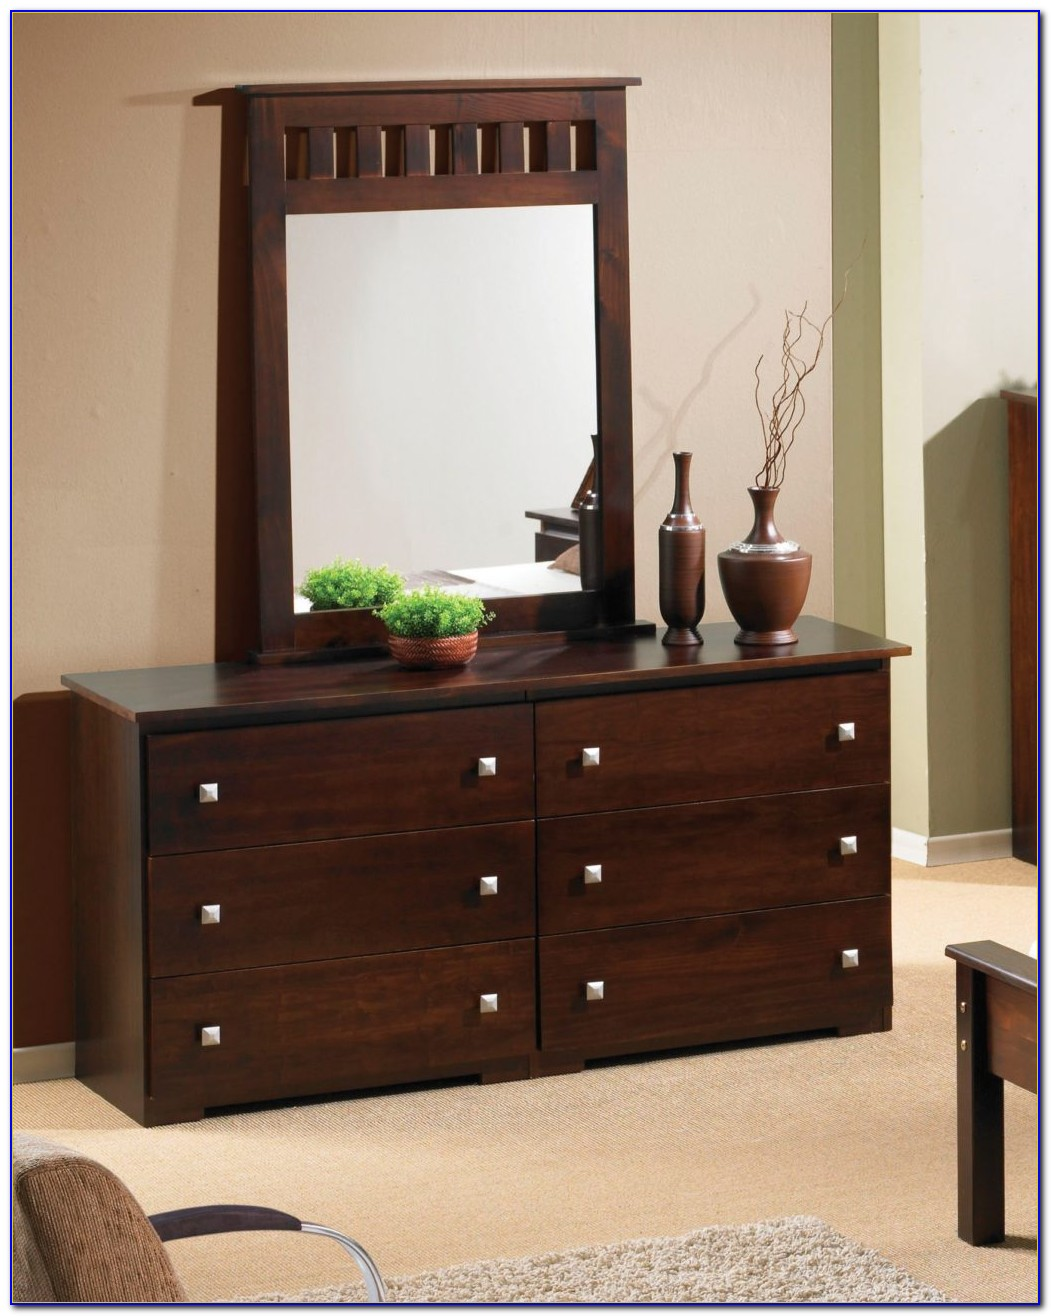 Ideas To Decorate A Dresser